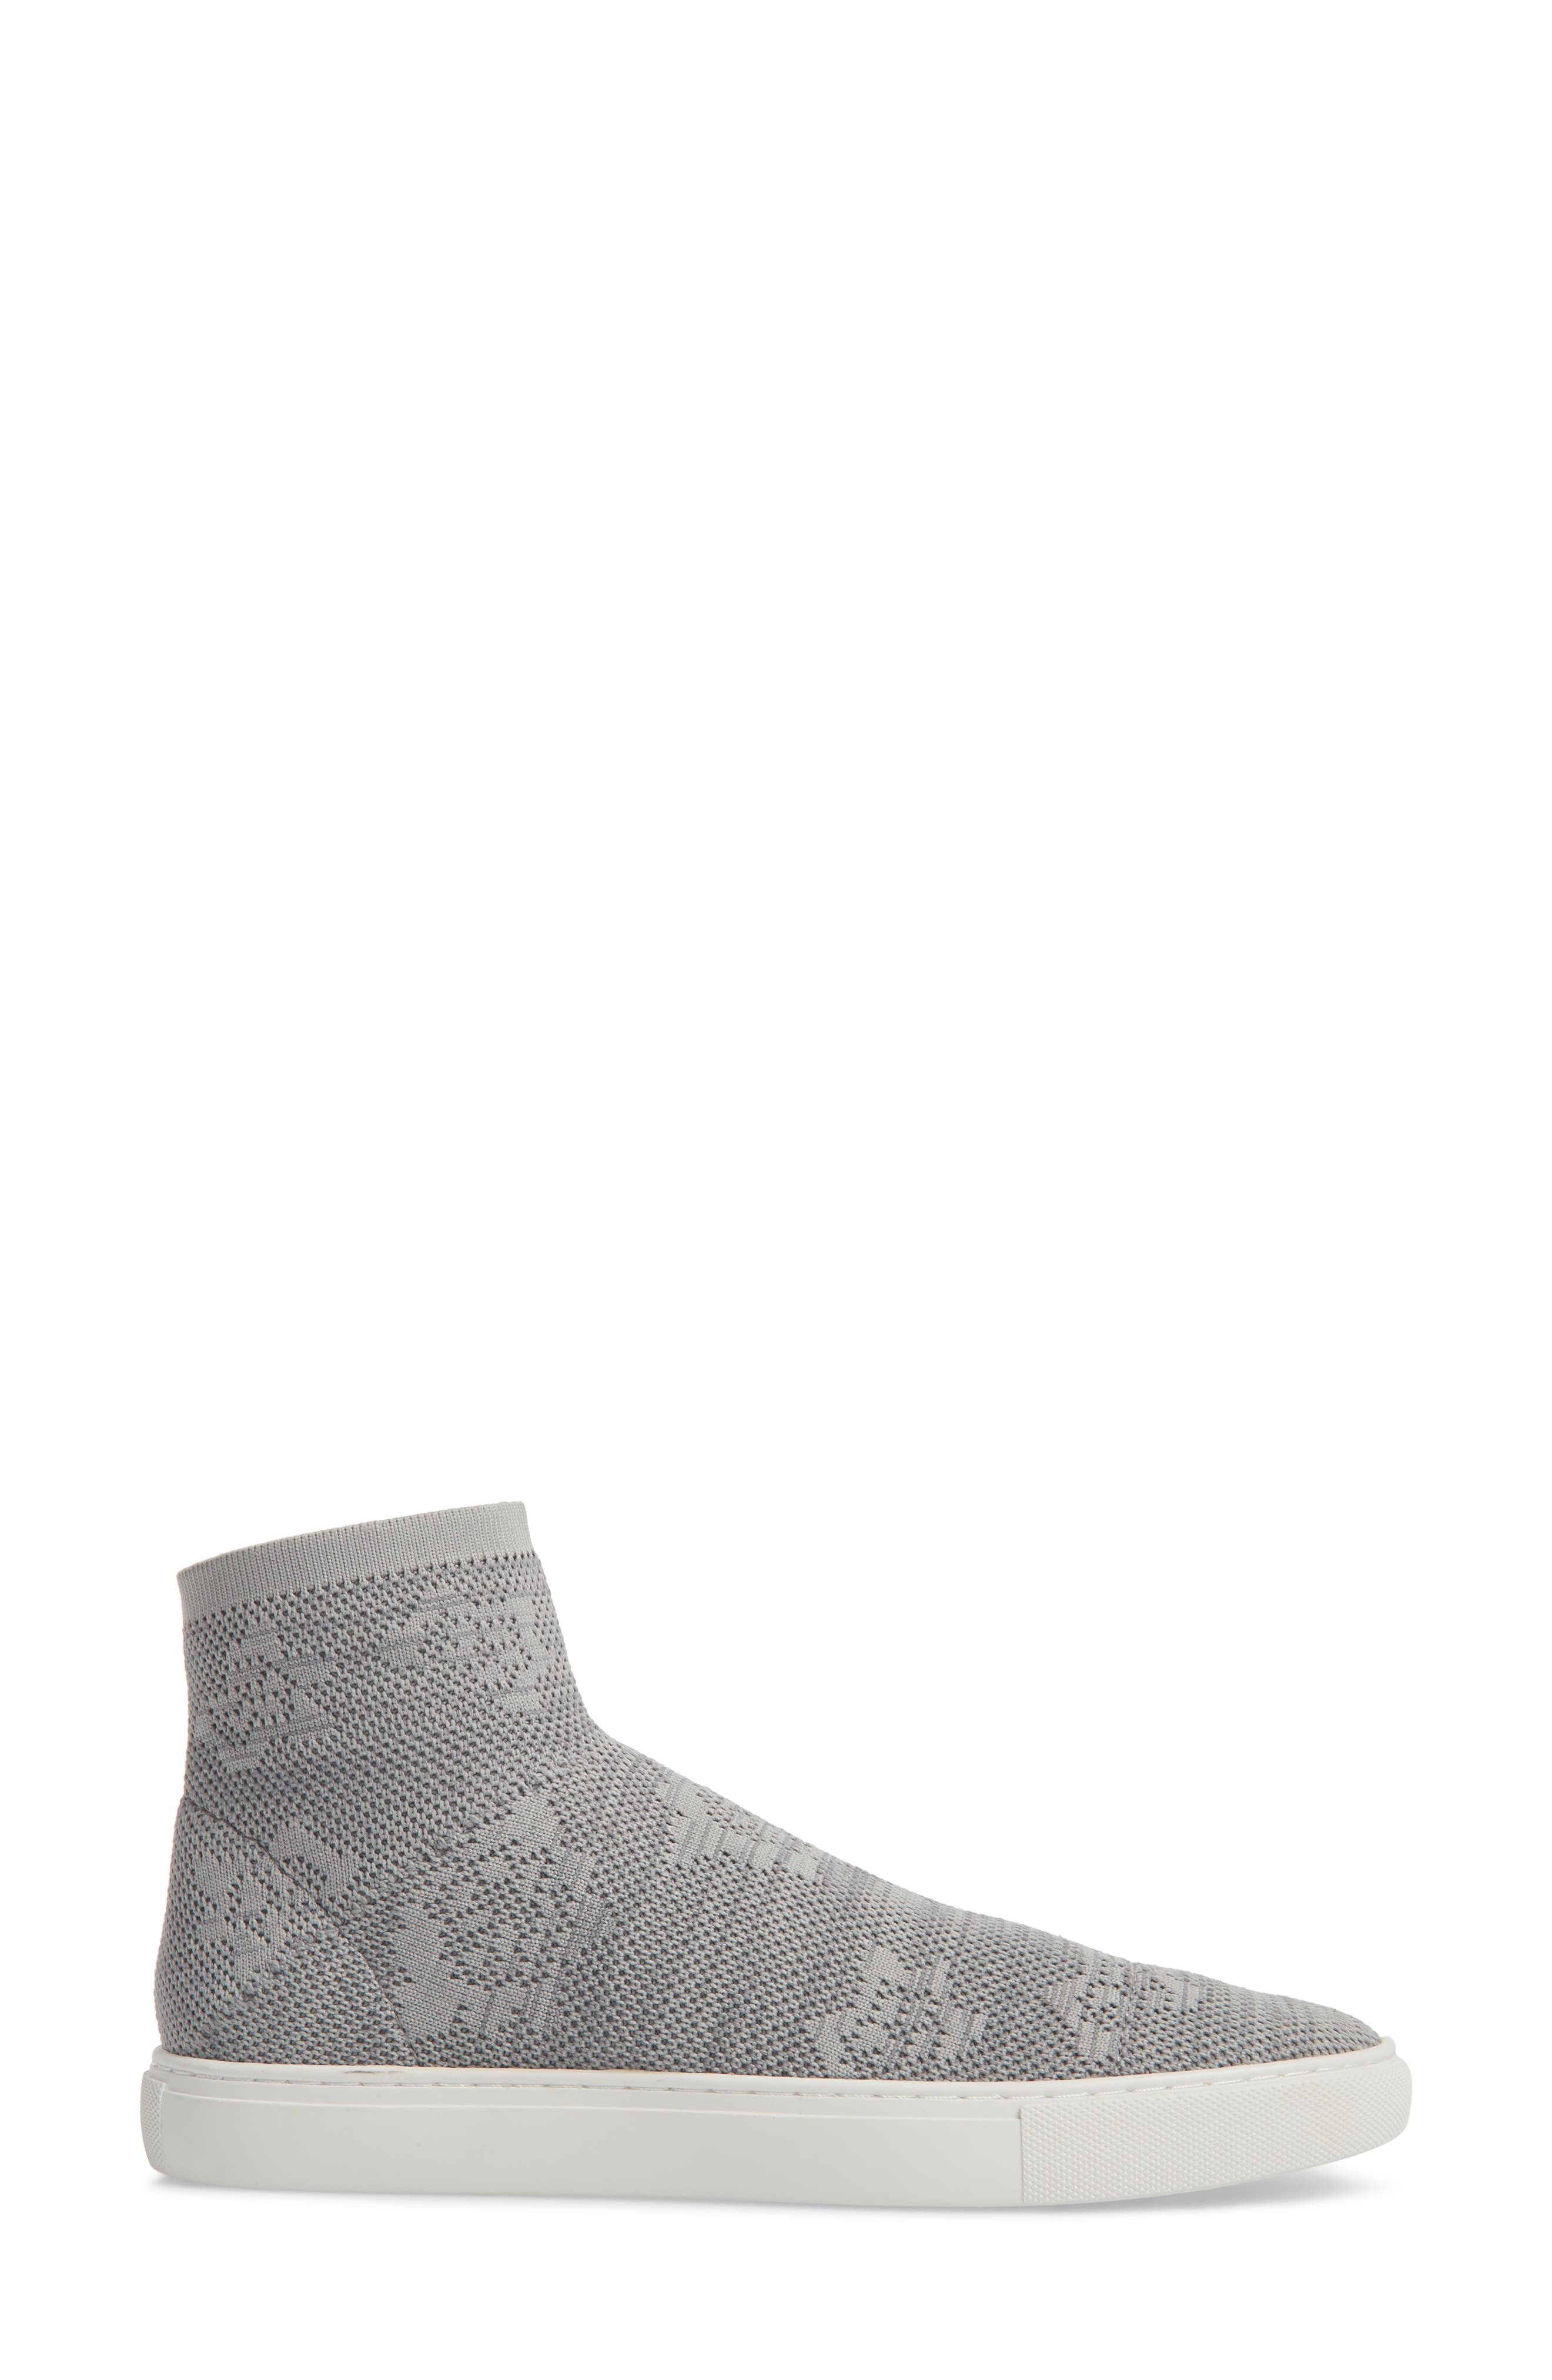 Keating Sneaker,                             Alternate thumbnail 3, color,                             Dust Grey Fabric